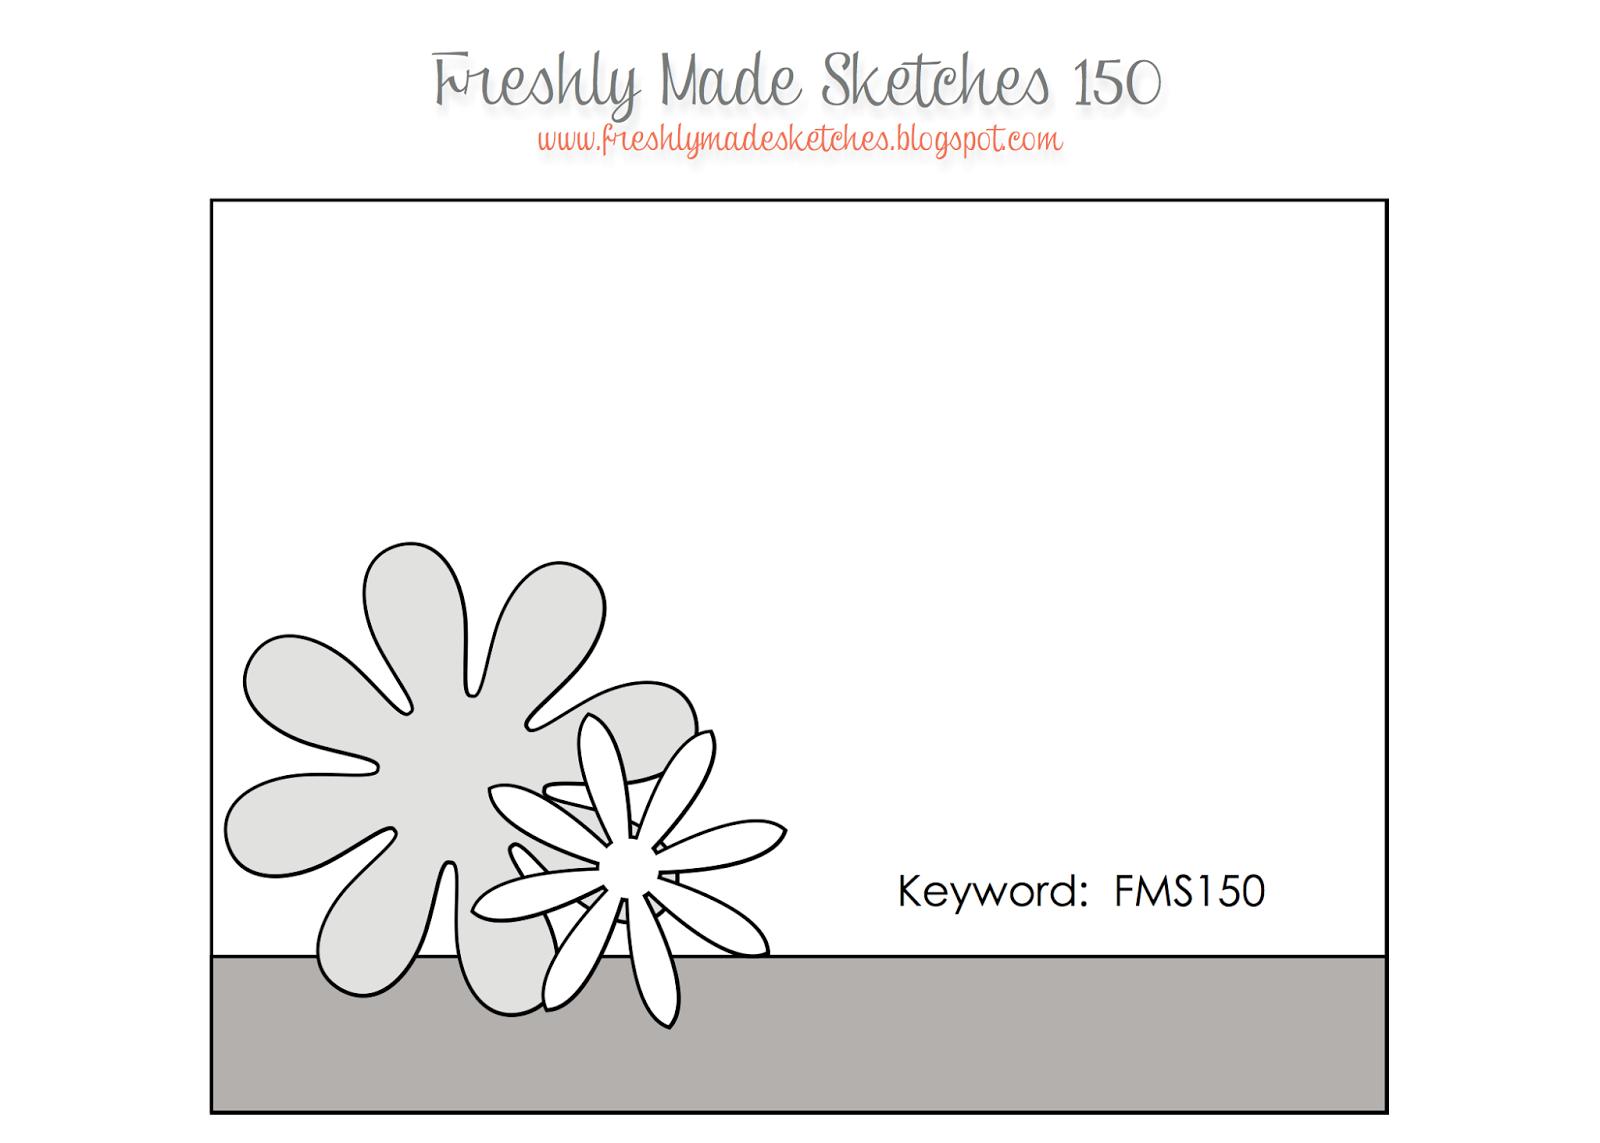 http://freshlymadesketches.blogspot.com/2014/08/freshly-made-sketches-150-sketch-by.html